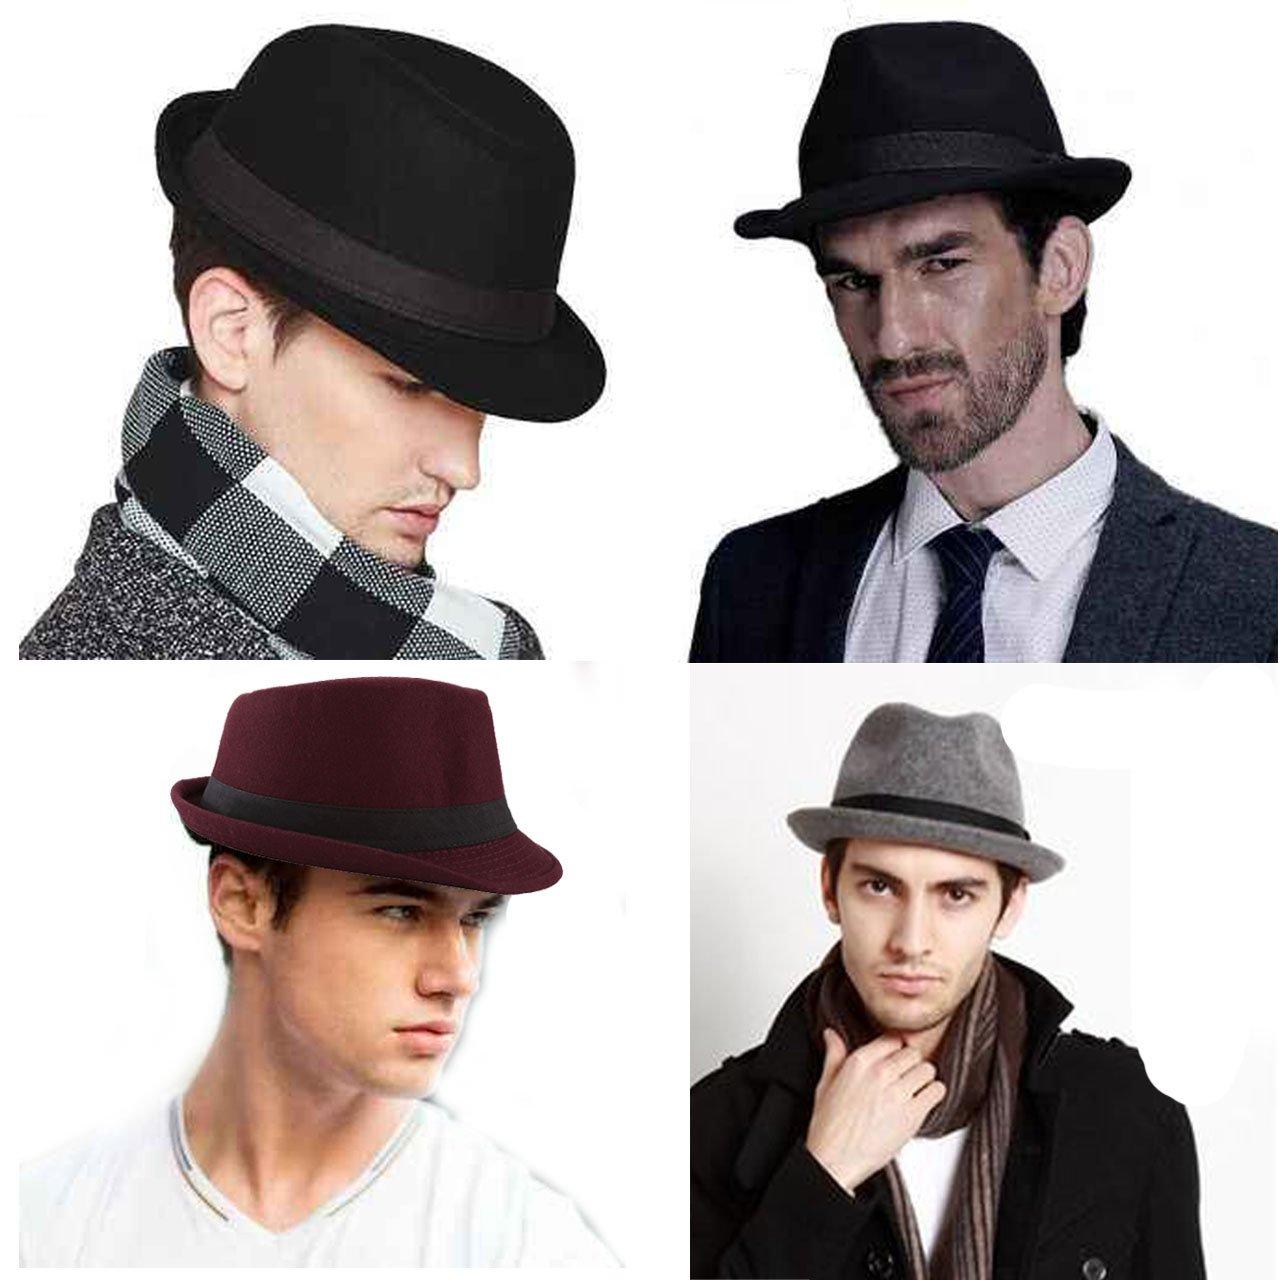 Unisex Classic Manhattan Fedora Hat Black Band Fashion Casual Jazz Wool Cap (Grey) by Faleto (Image #7)